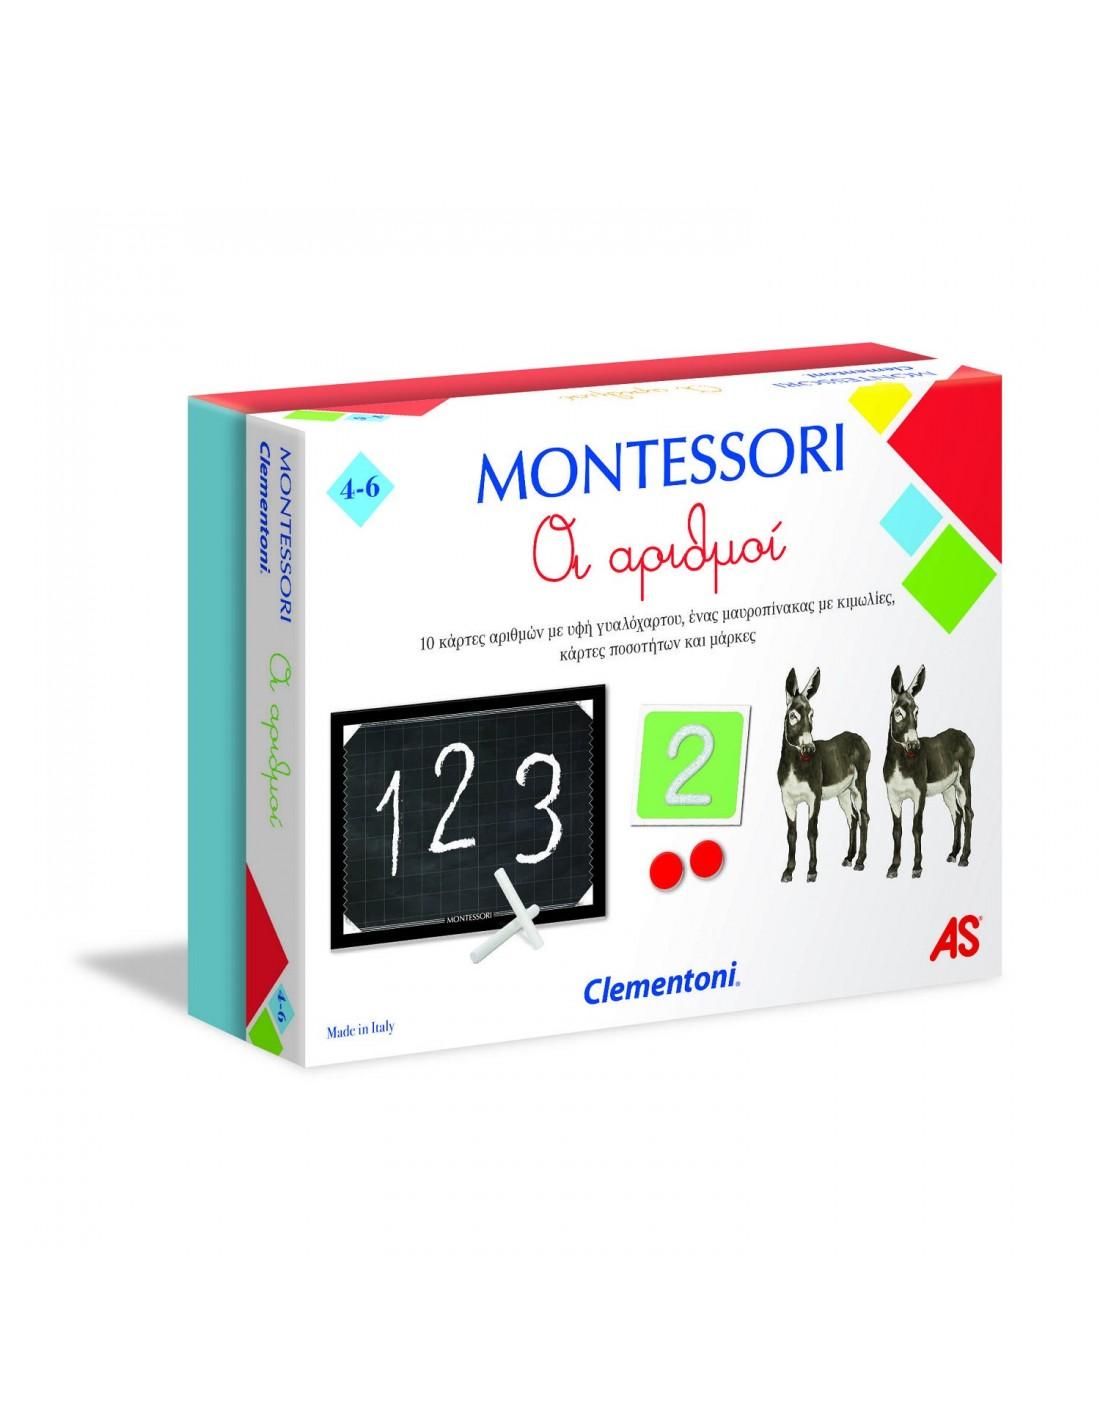 MONTESSORI-ΟΙ ΑΡΙΘΜΟΙ